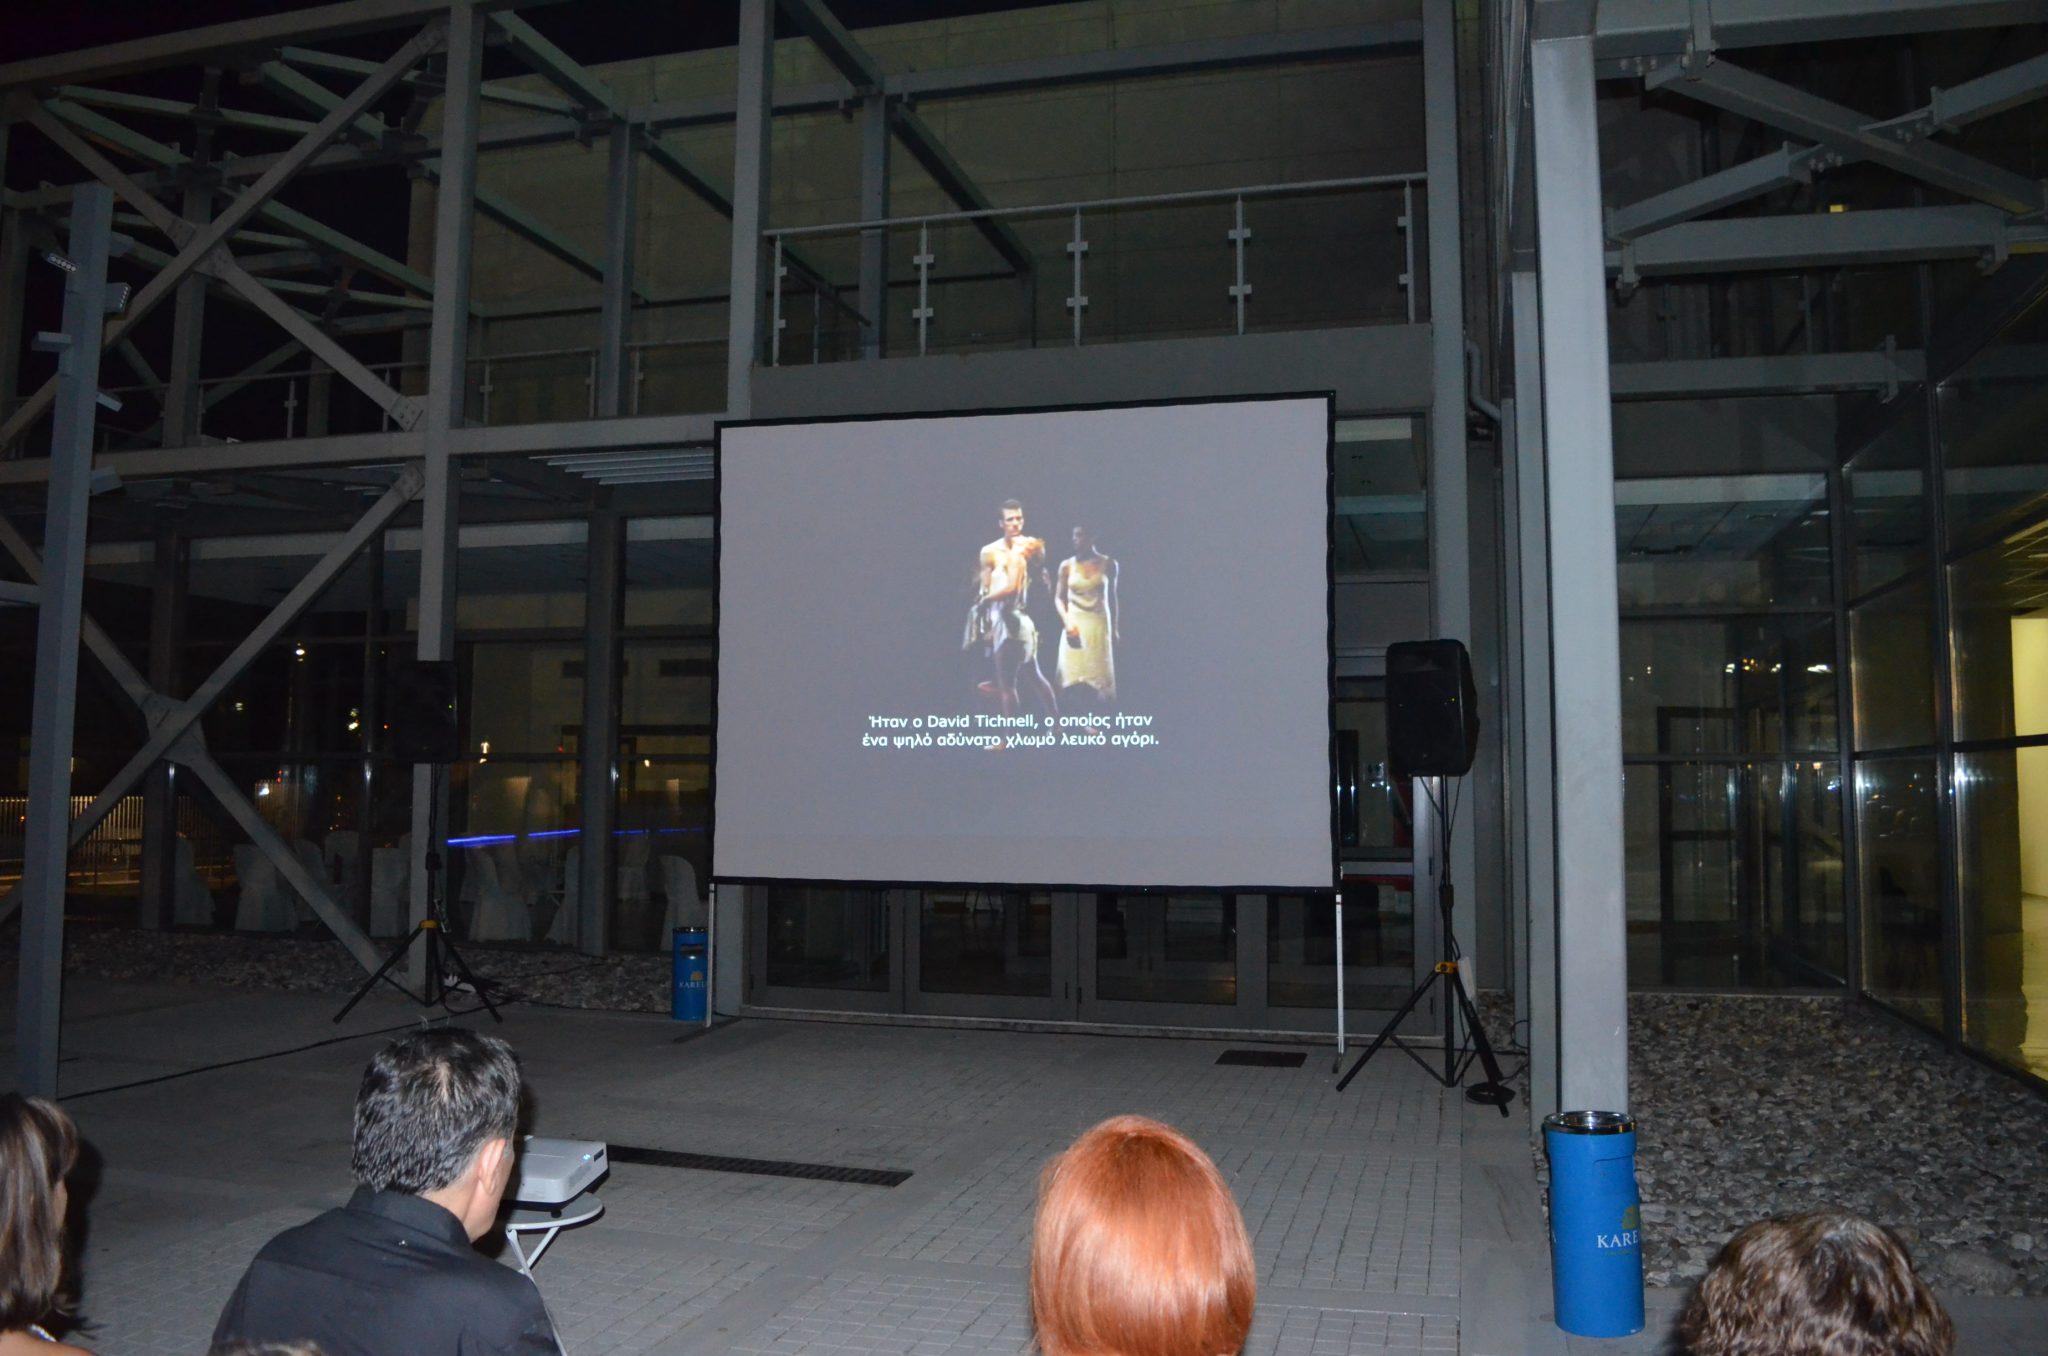 Mε θετικό πρόσημο ολοκληρώθηκε το 23ο Διεθνές Φεστιβάλ Χορού